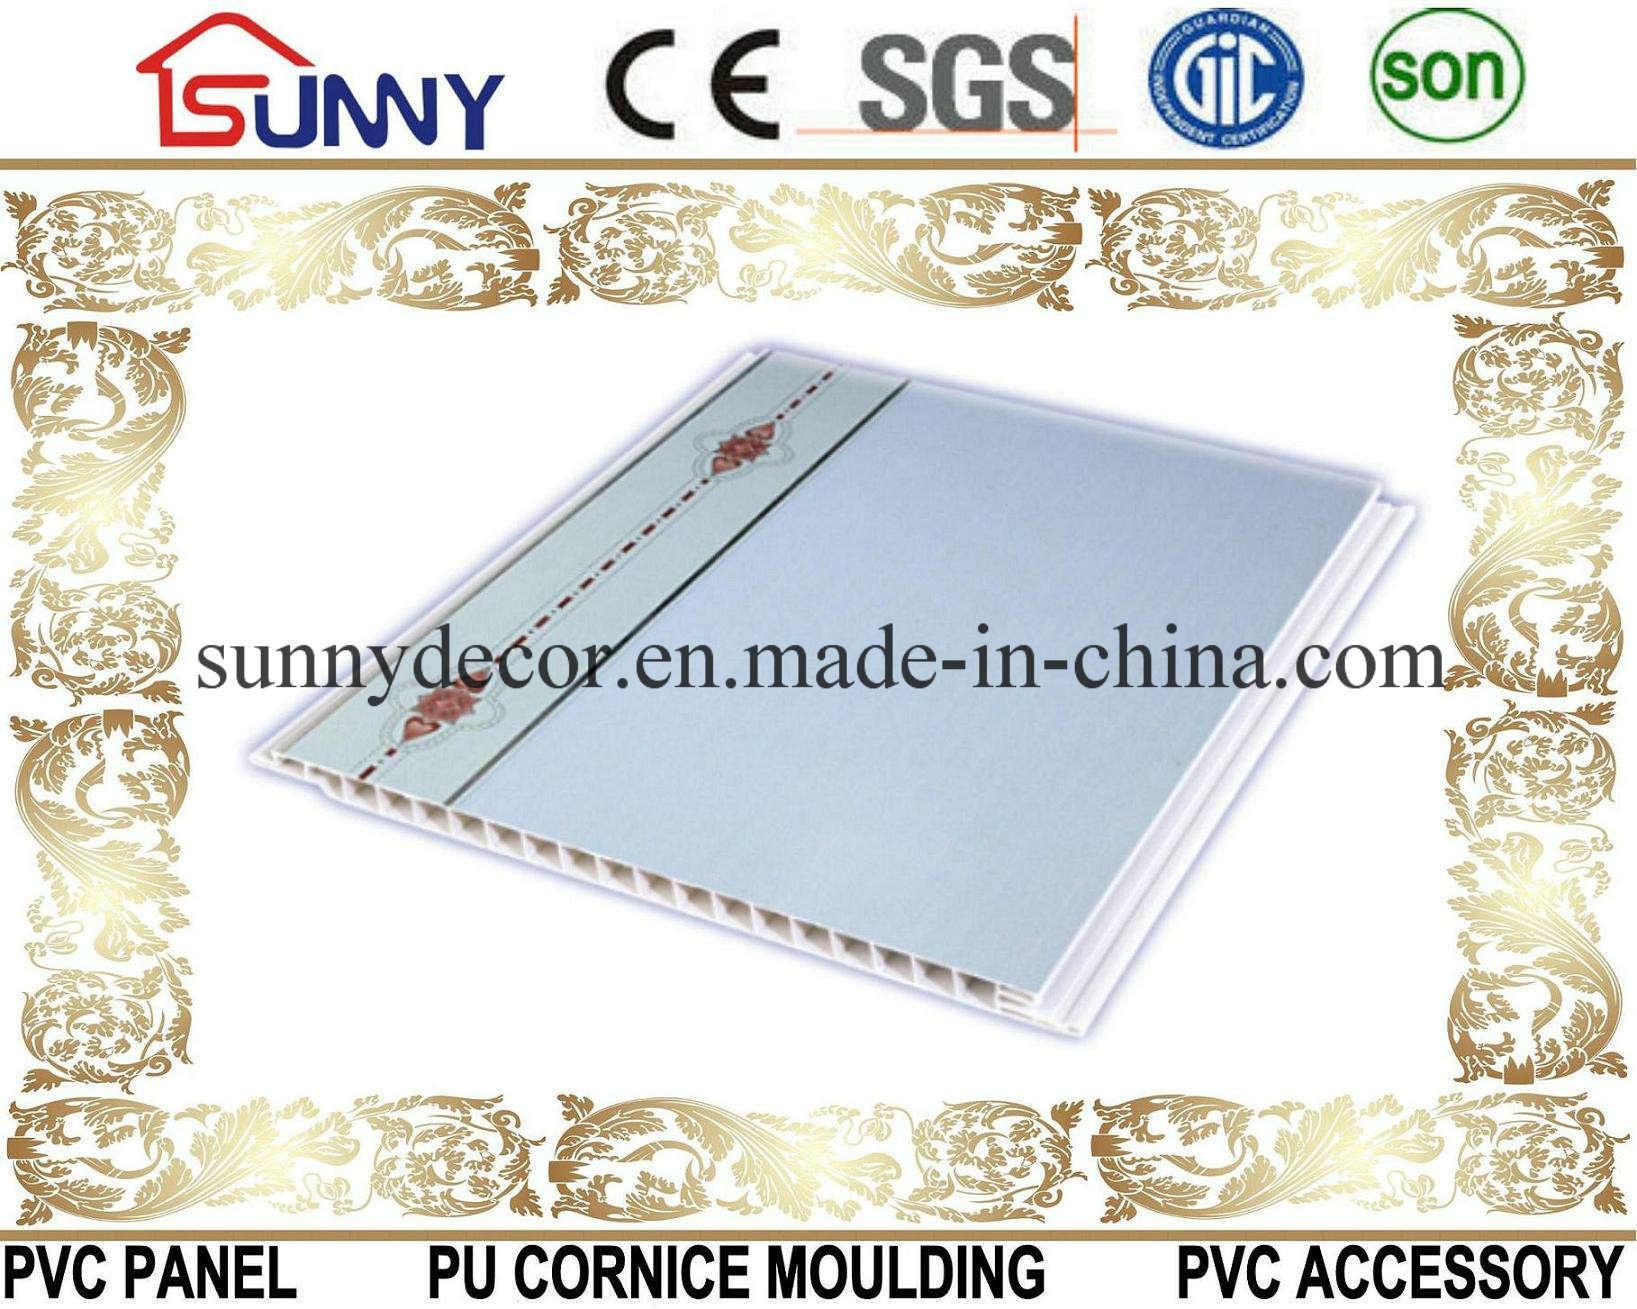 PVC Ceiling-PVC Panel and PVC Wall Panel